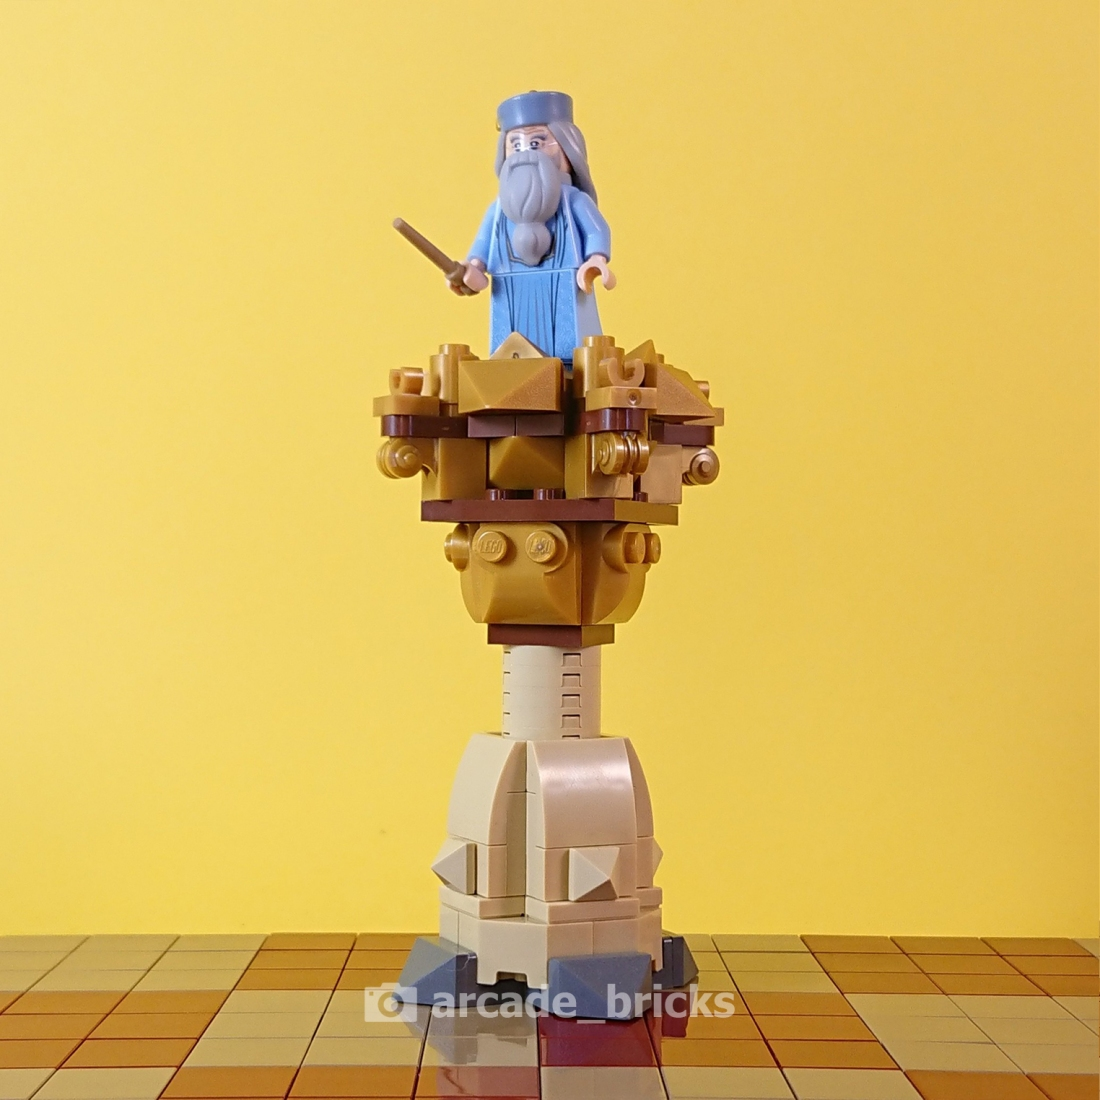 arcade_bricks_chess_good_01_king